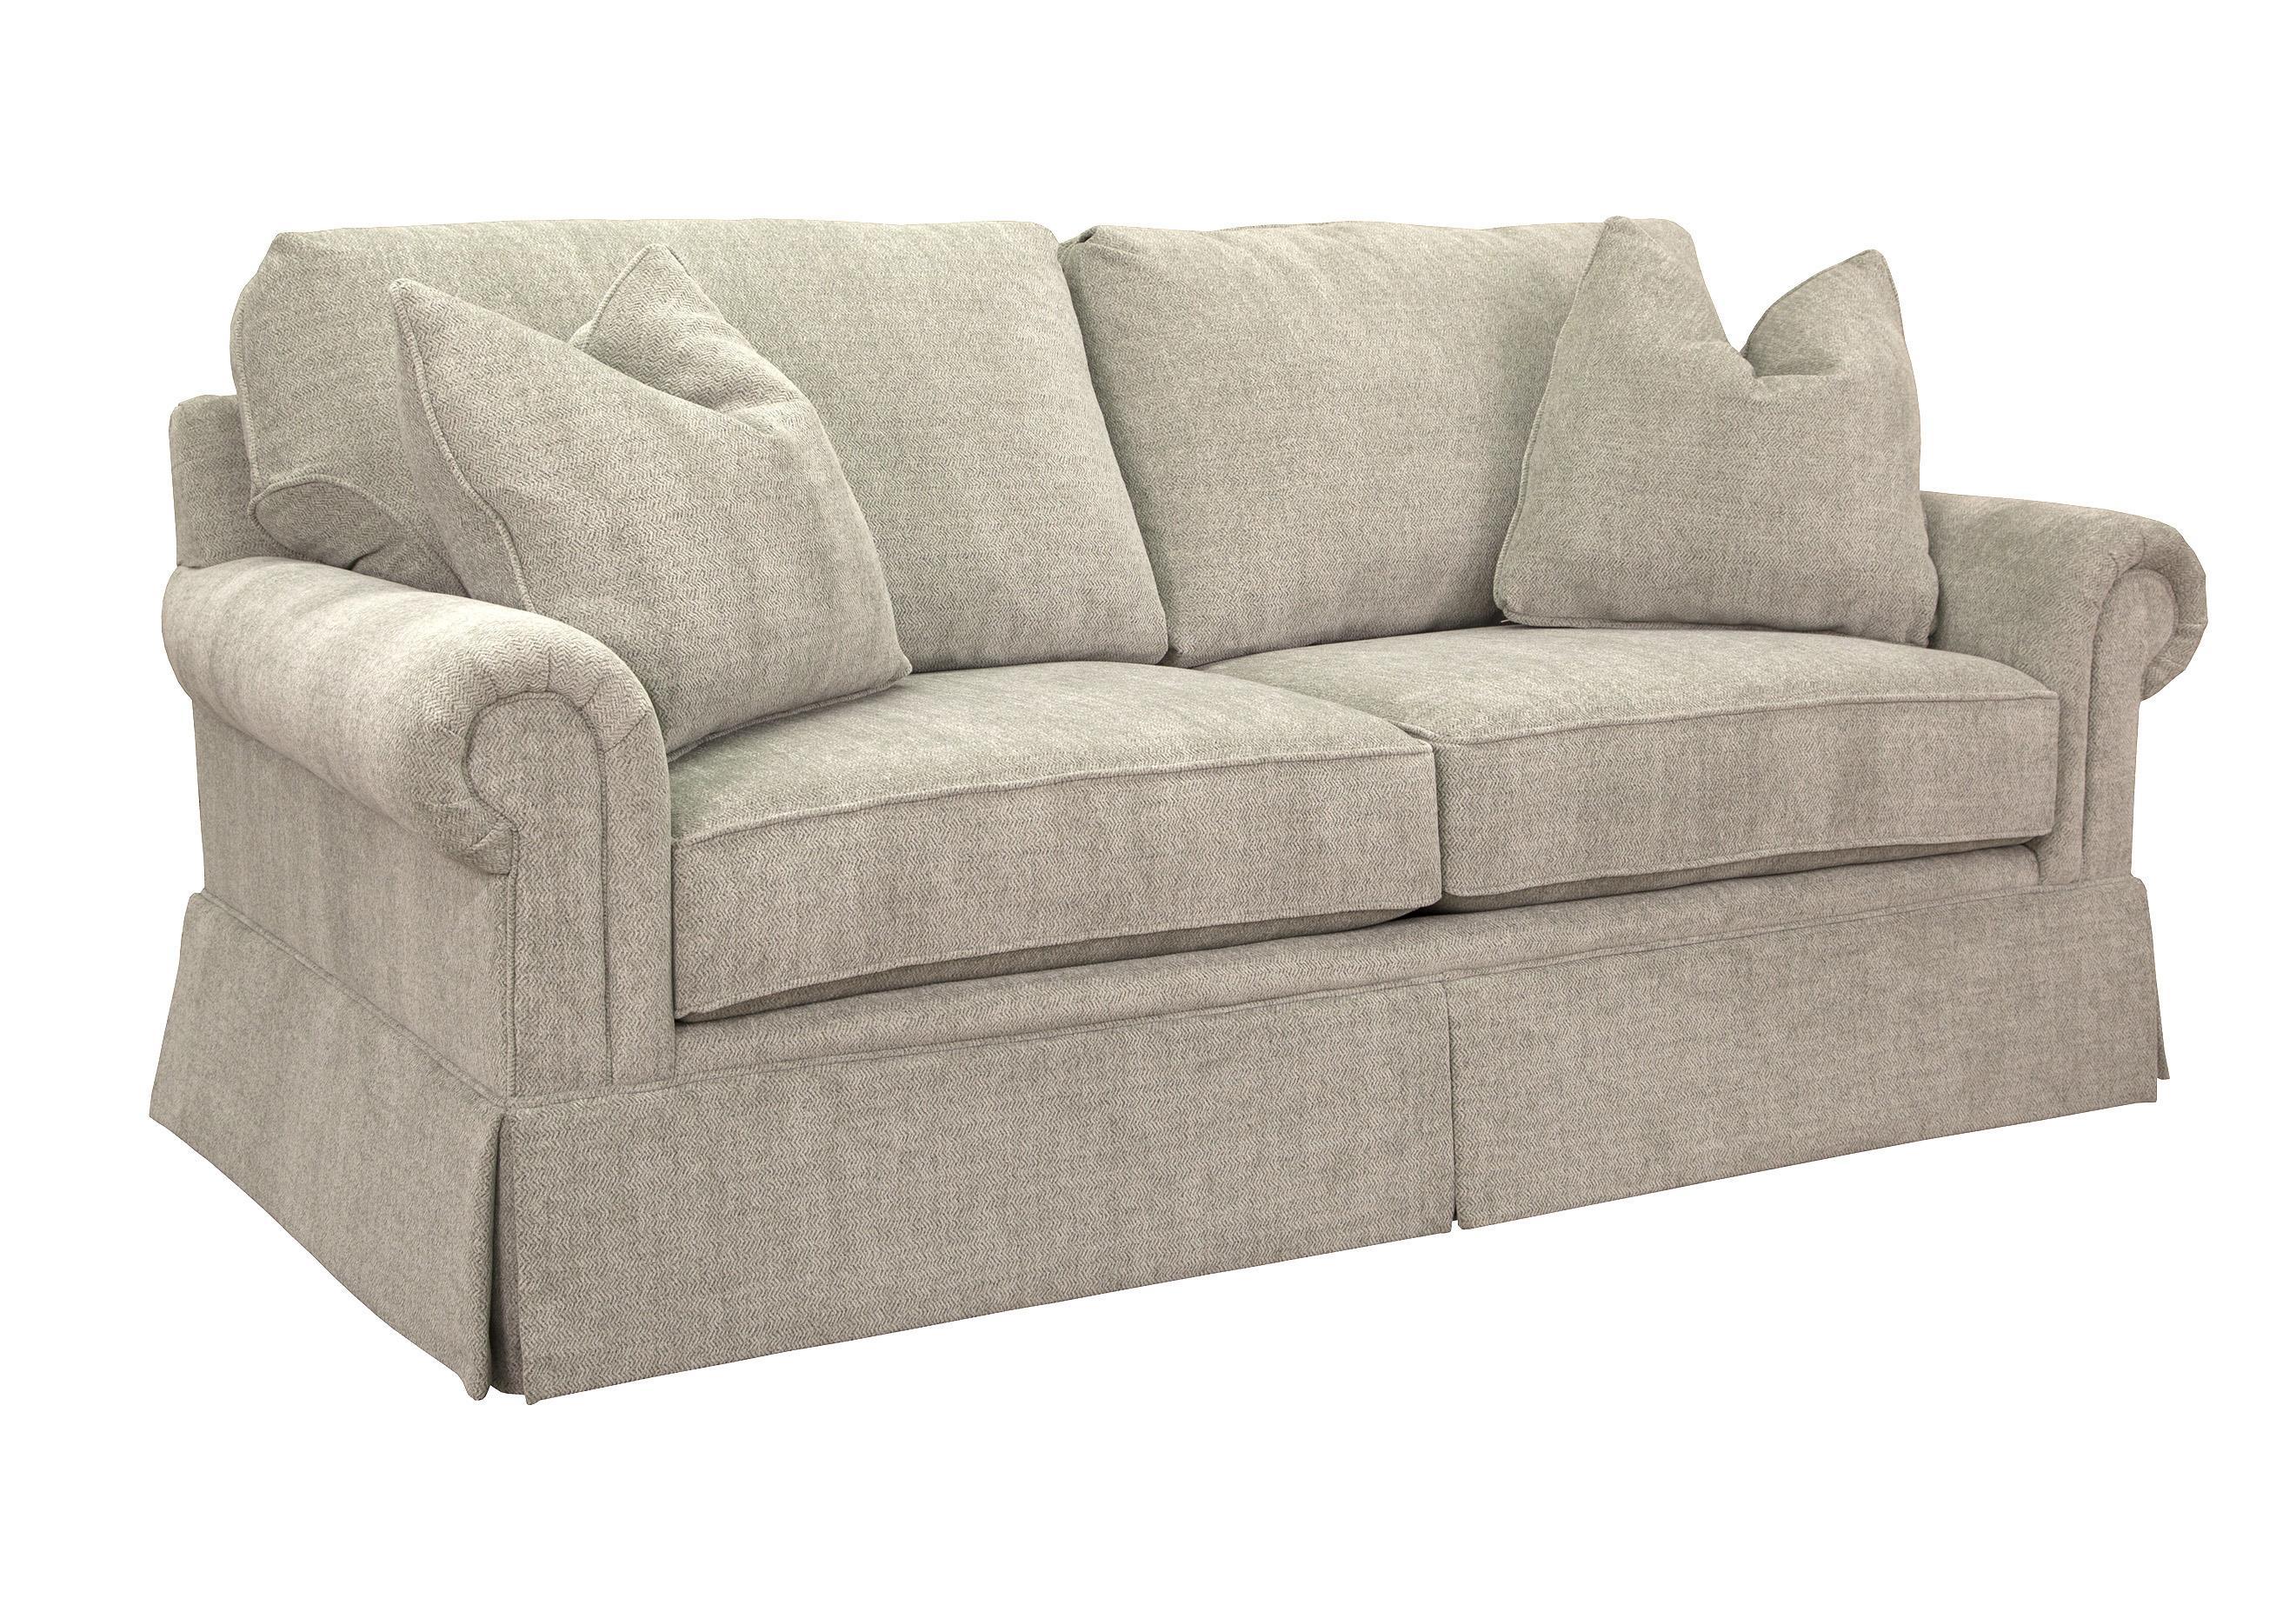 Huntington House Sofa Cushions Sofa Hpricot